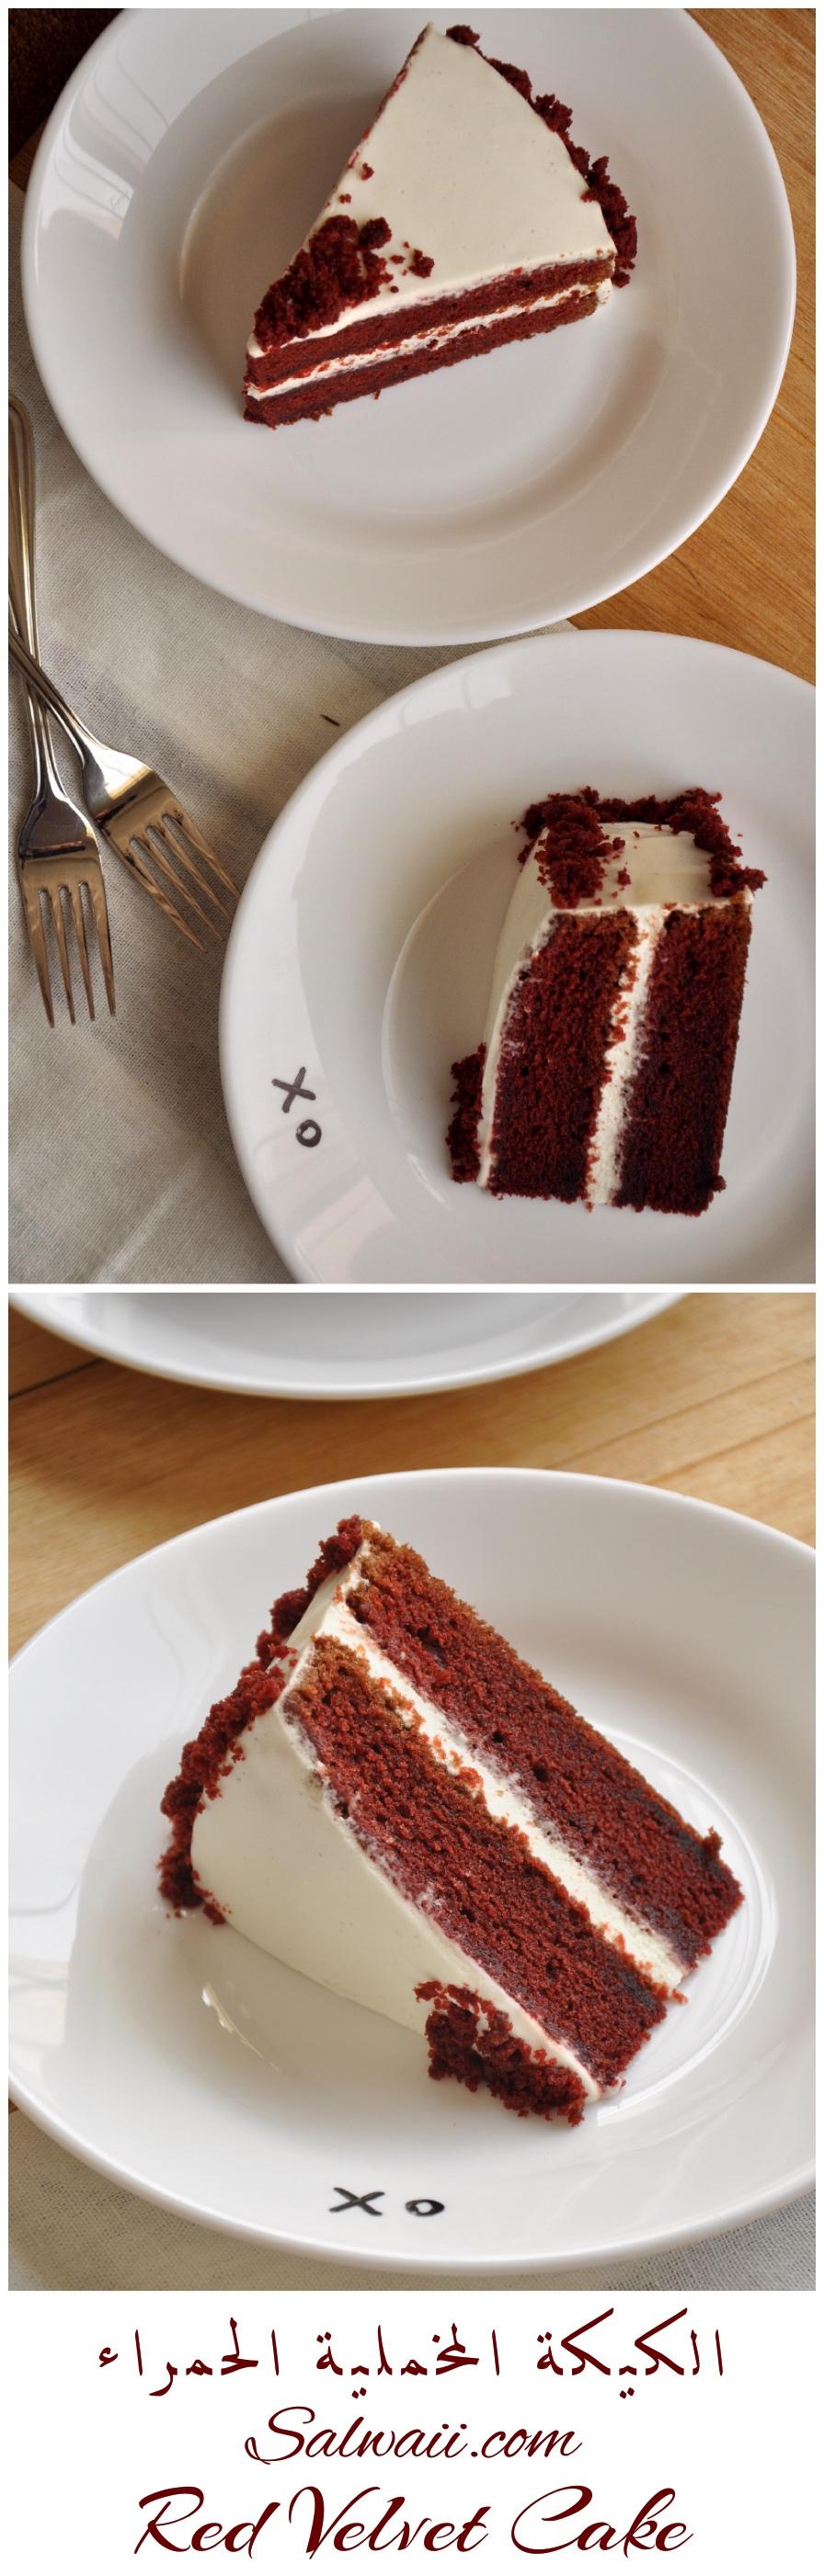 Pin On Cake Dessert كيك وحلويات